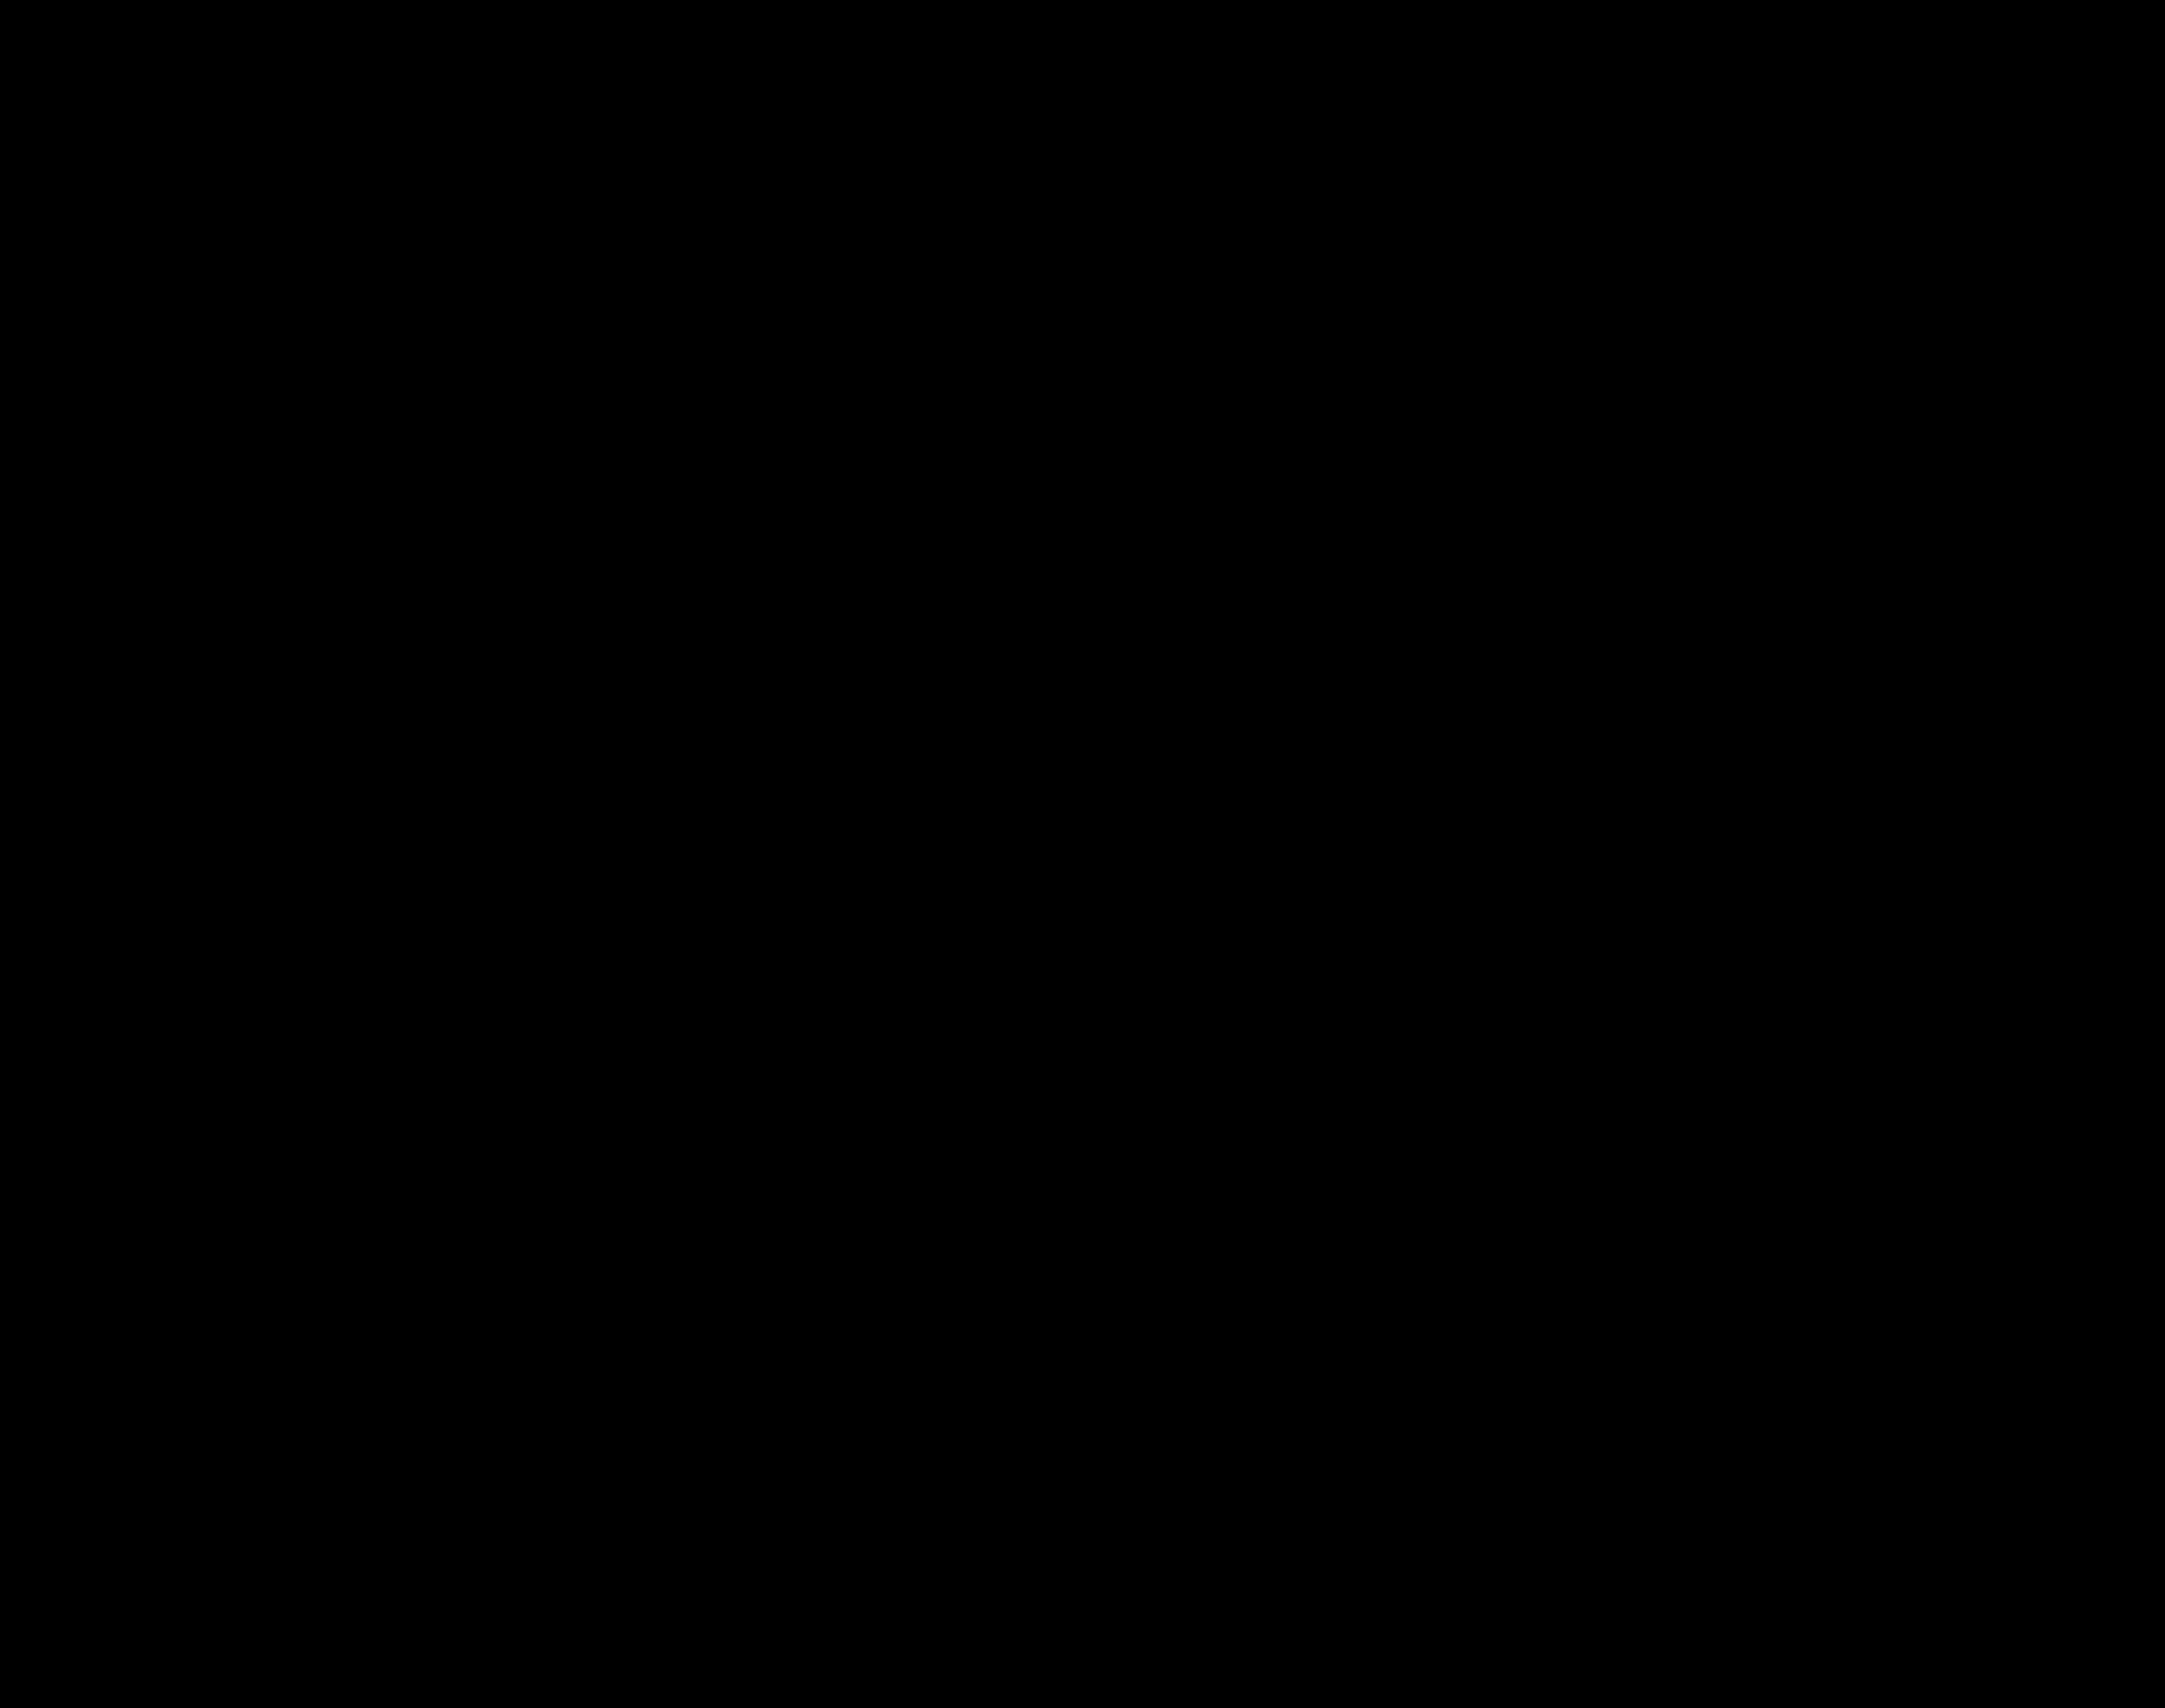 20170612_110432